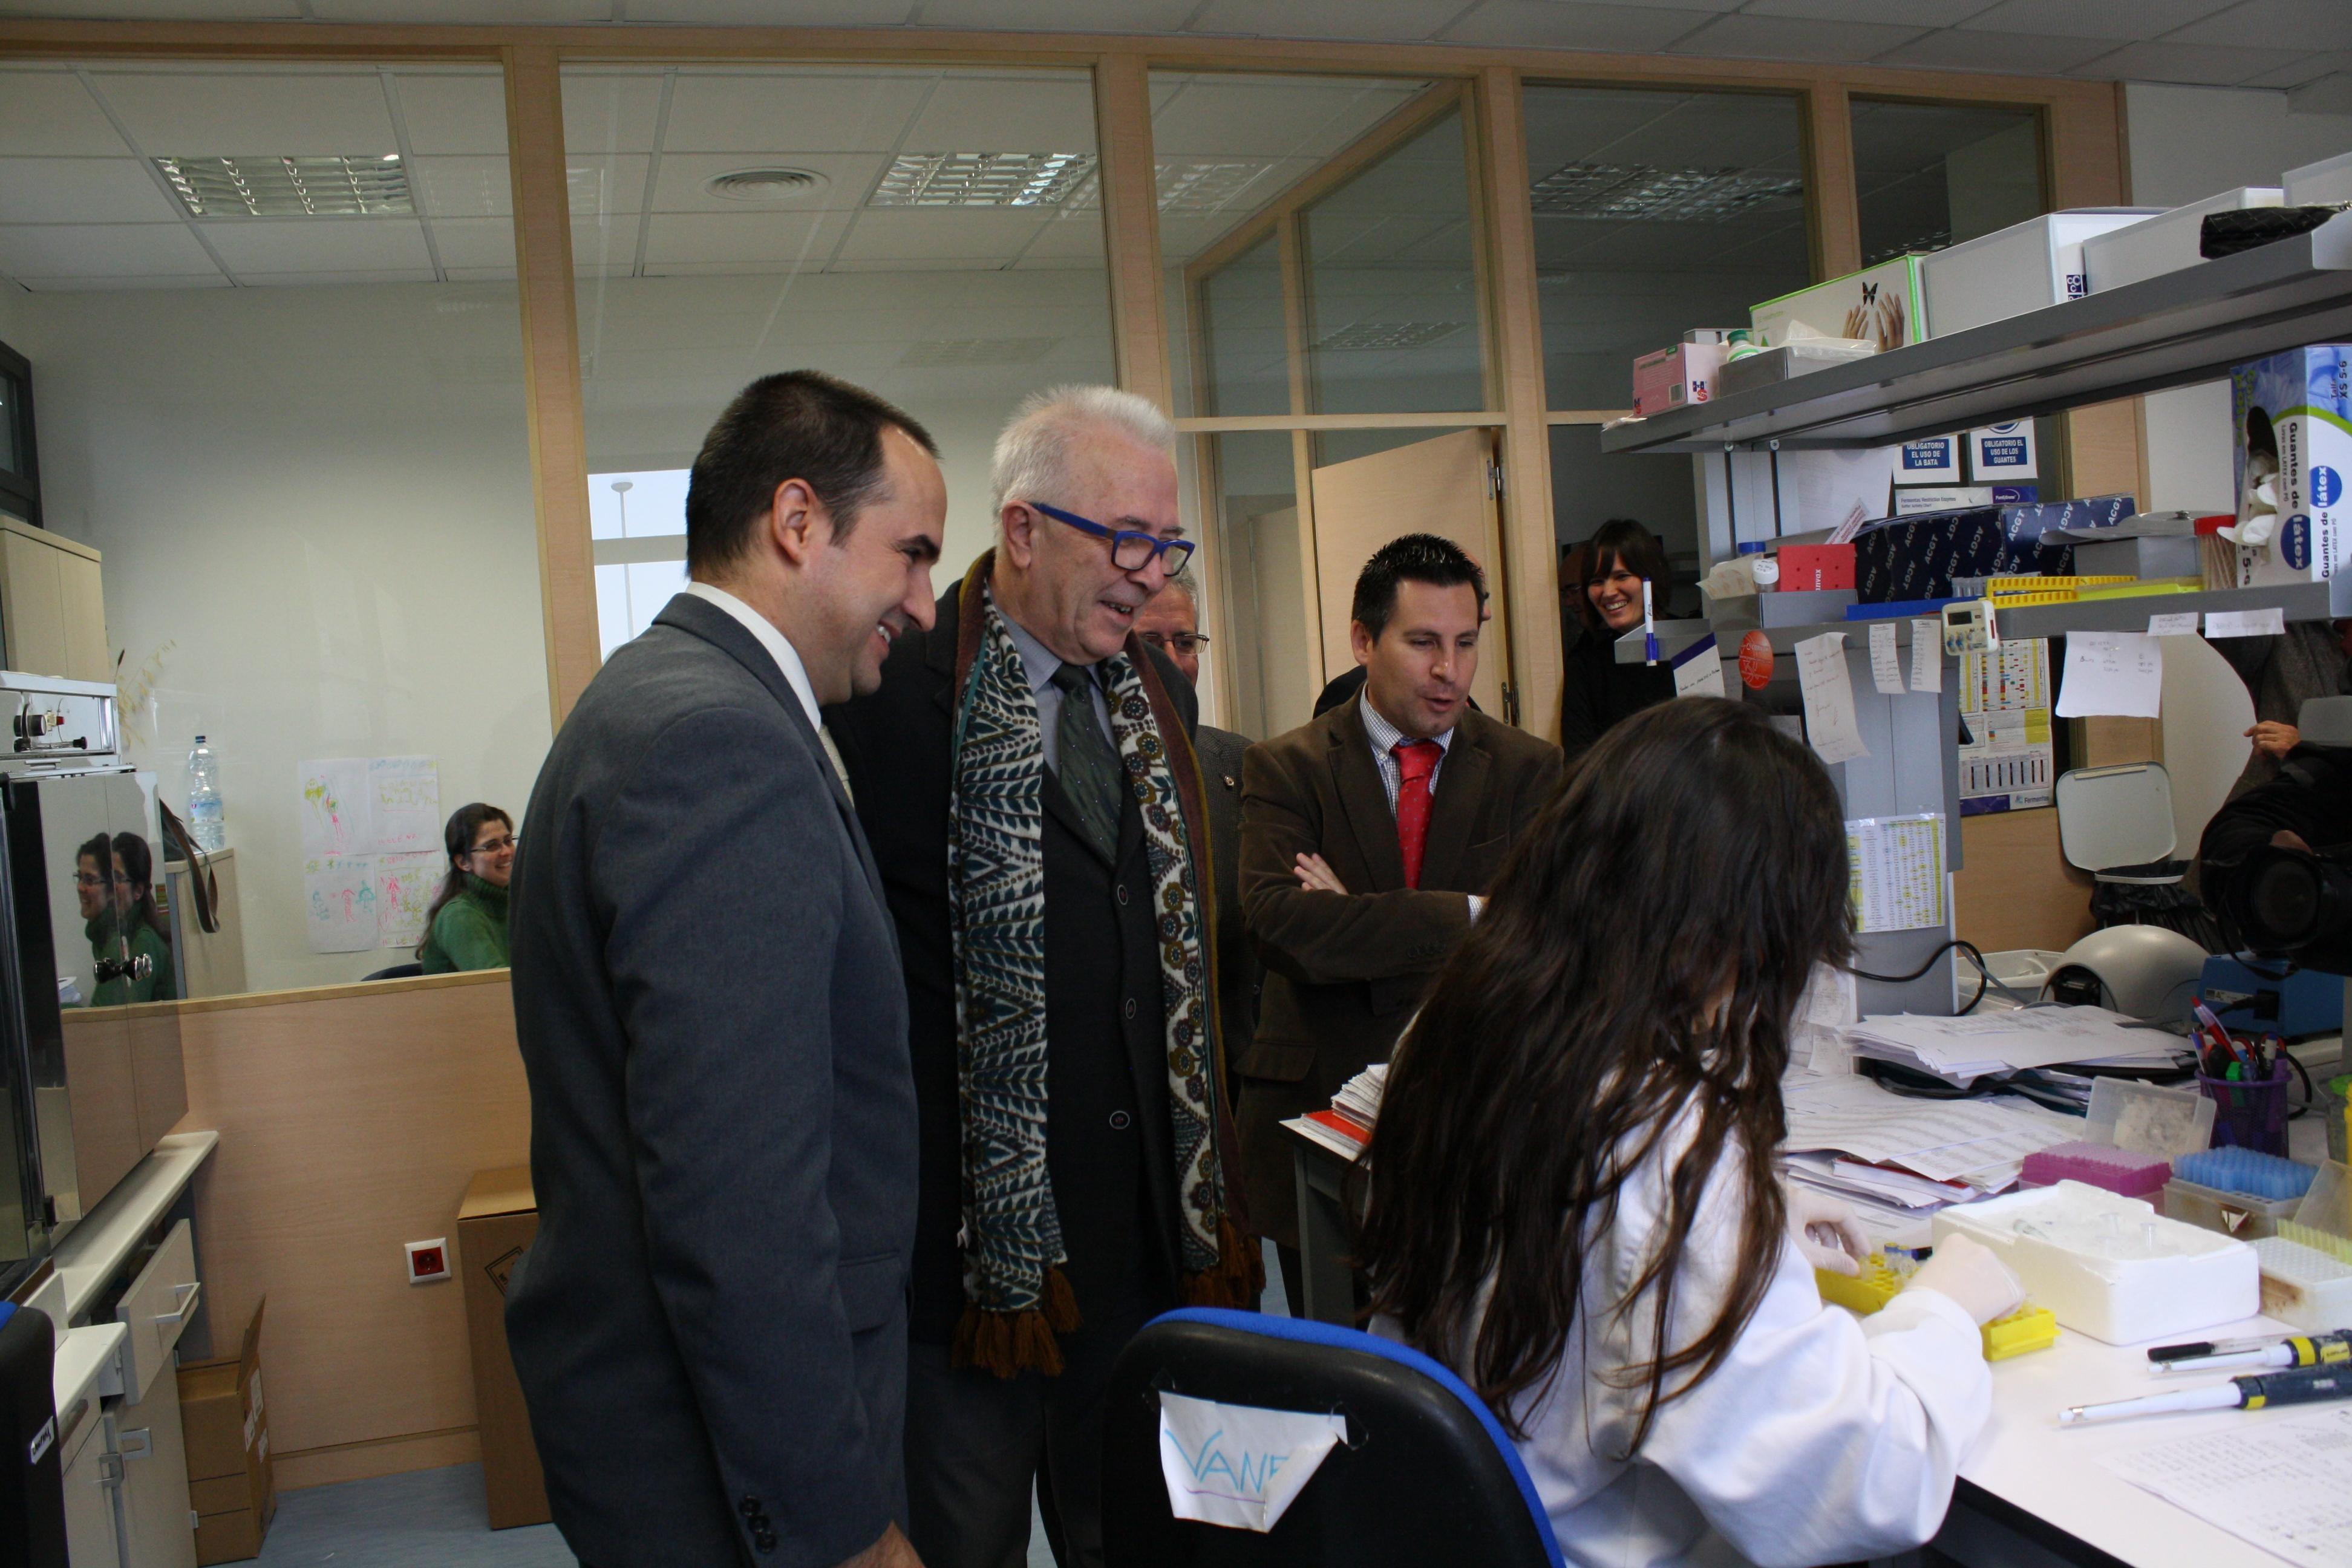 Un momento de la visita del consejero a Canvax Biotech